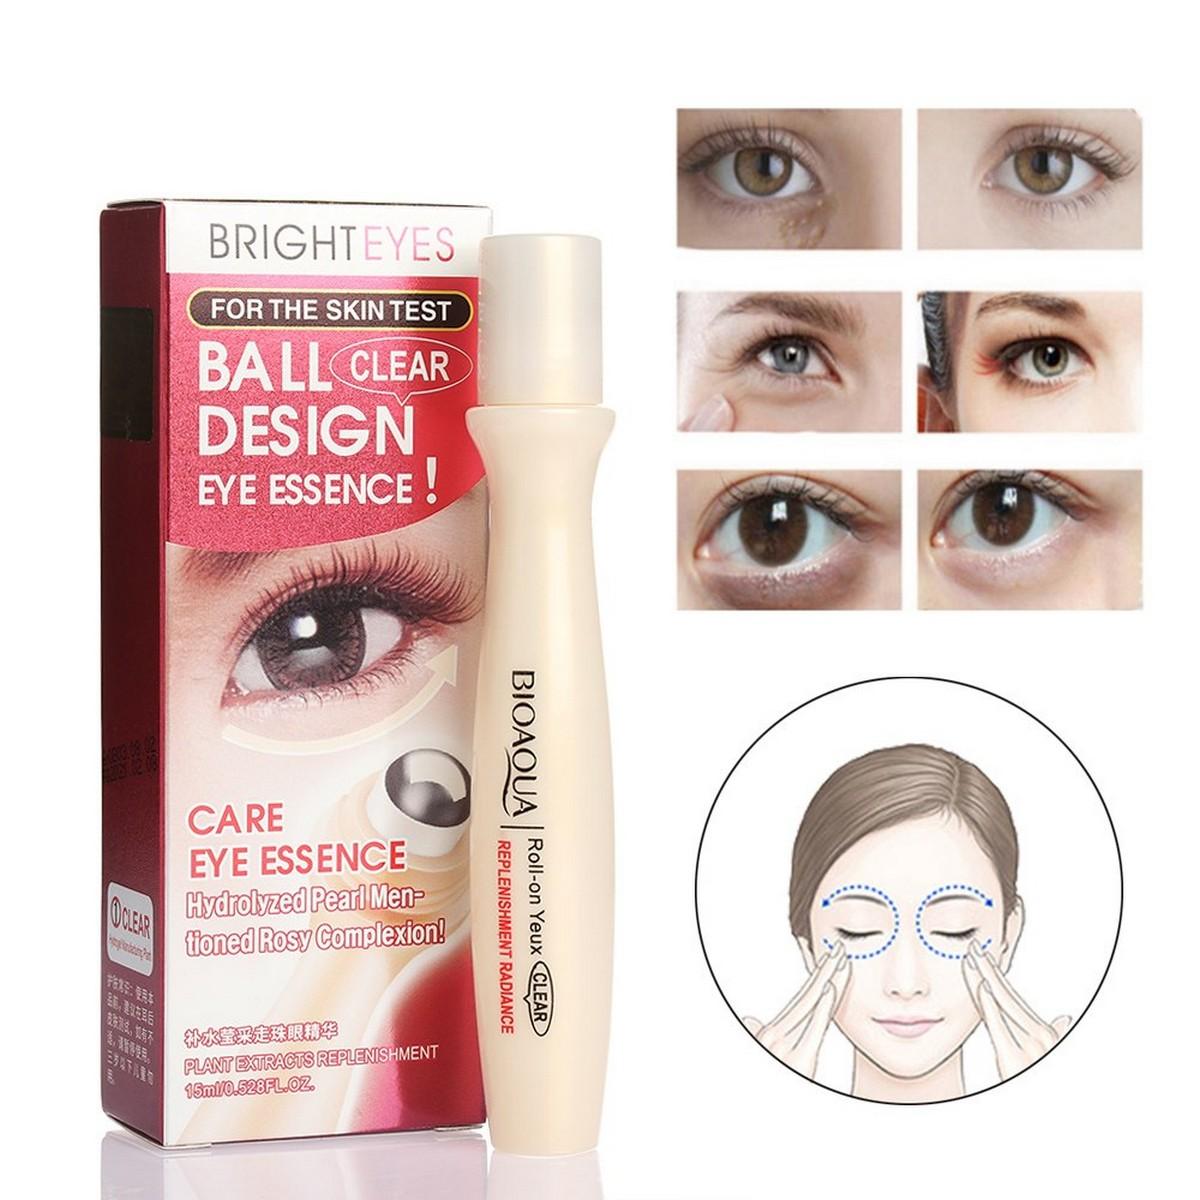 Roll Ball Eye Anti Wrinkle Remove Dark Circles Moisturizing Eye Cream